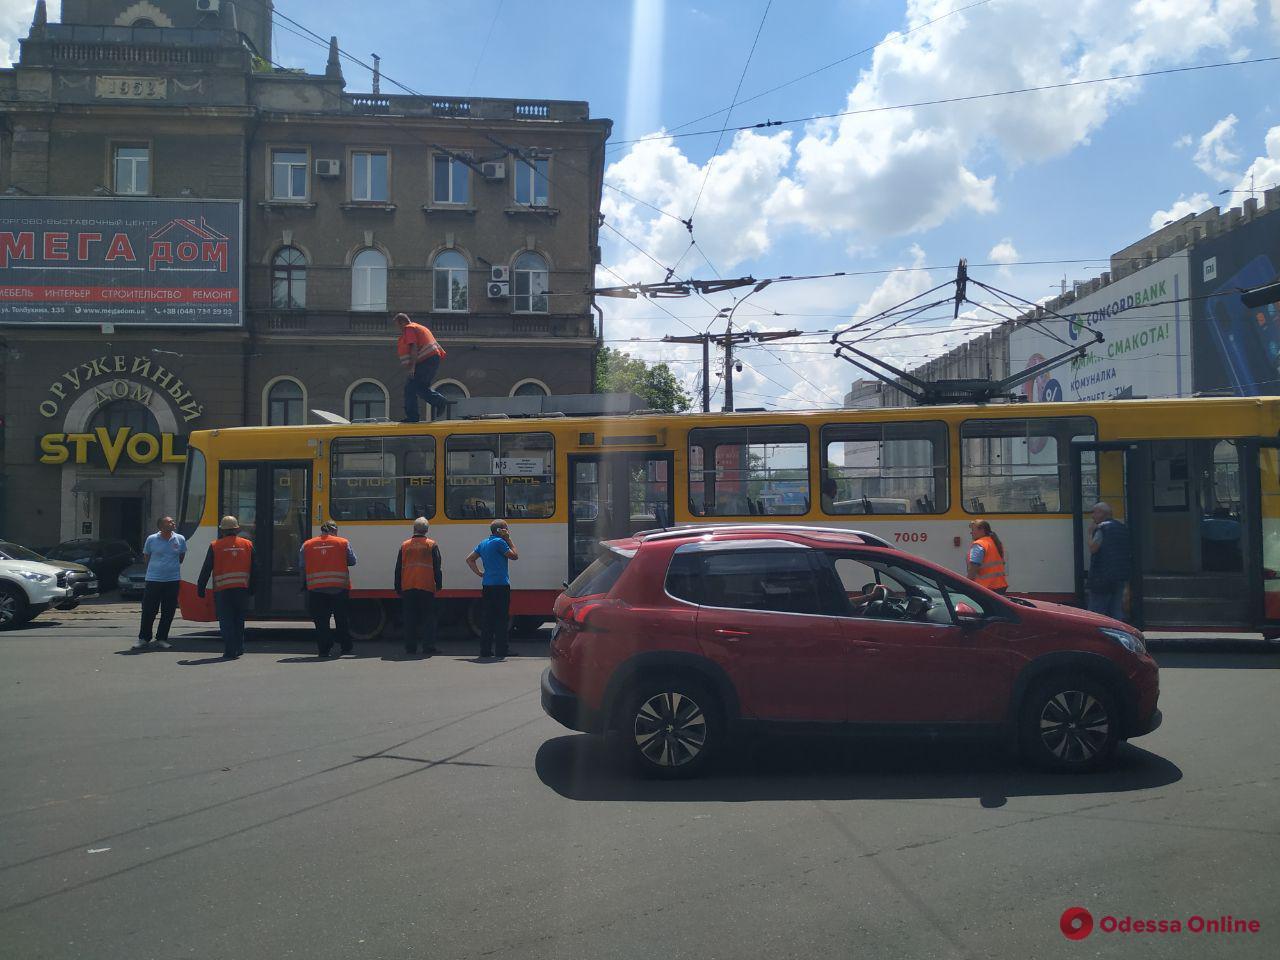 На Пантелеймоновской из-за обрыва проводов не ходят трамваи